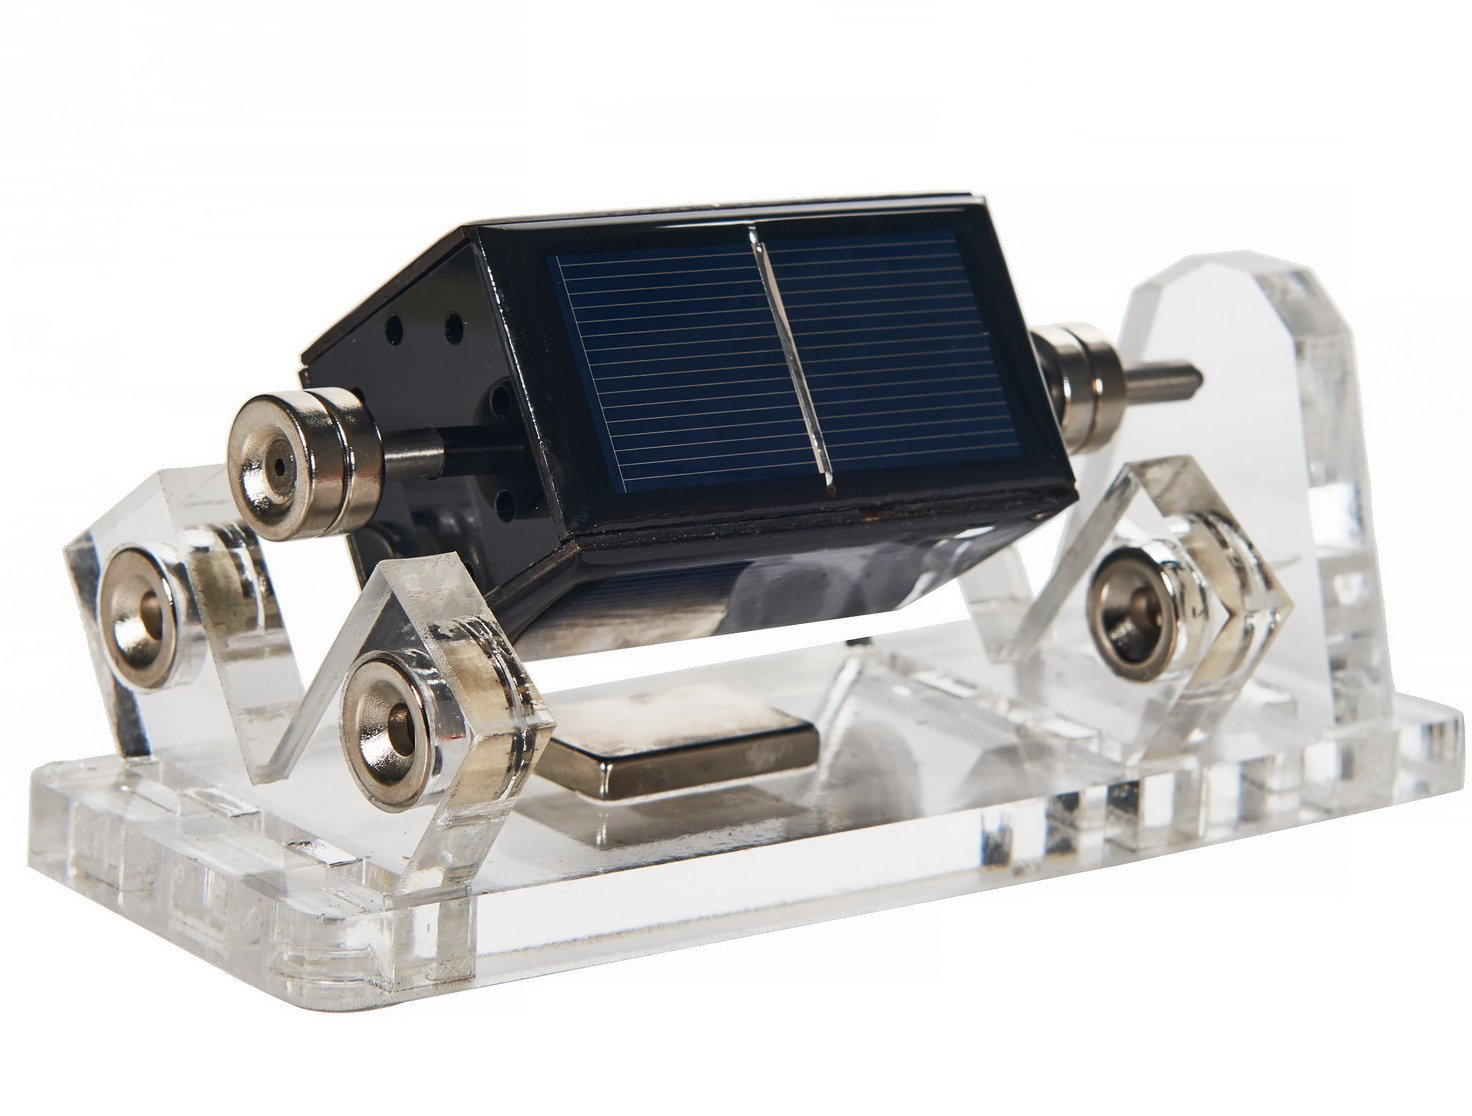 3f104216131 Details about Solar Mendocino Motor Magnetic Levitating Educational Model  No Propeller